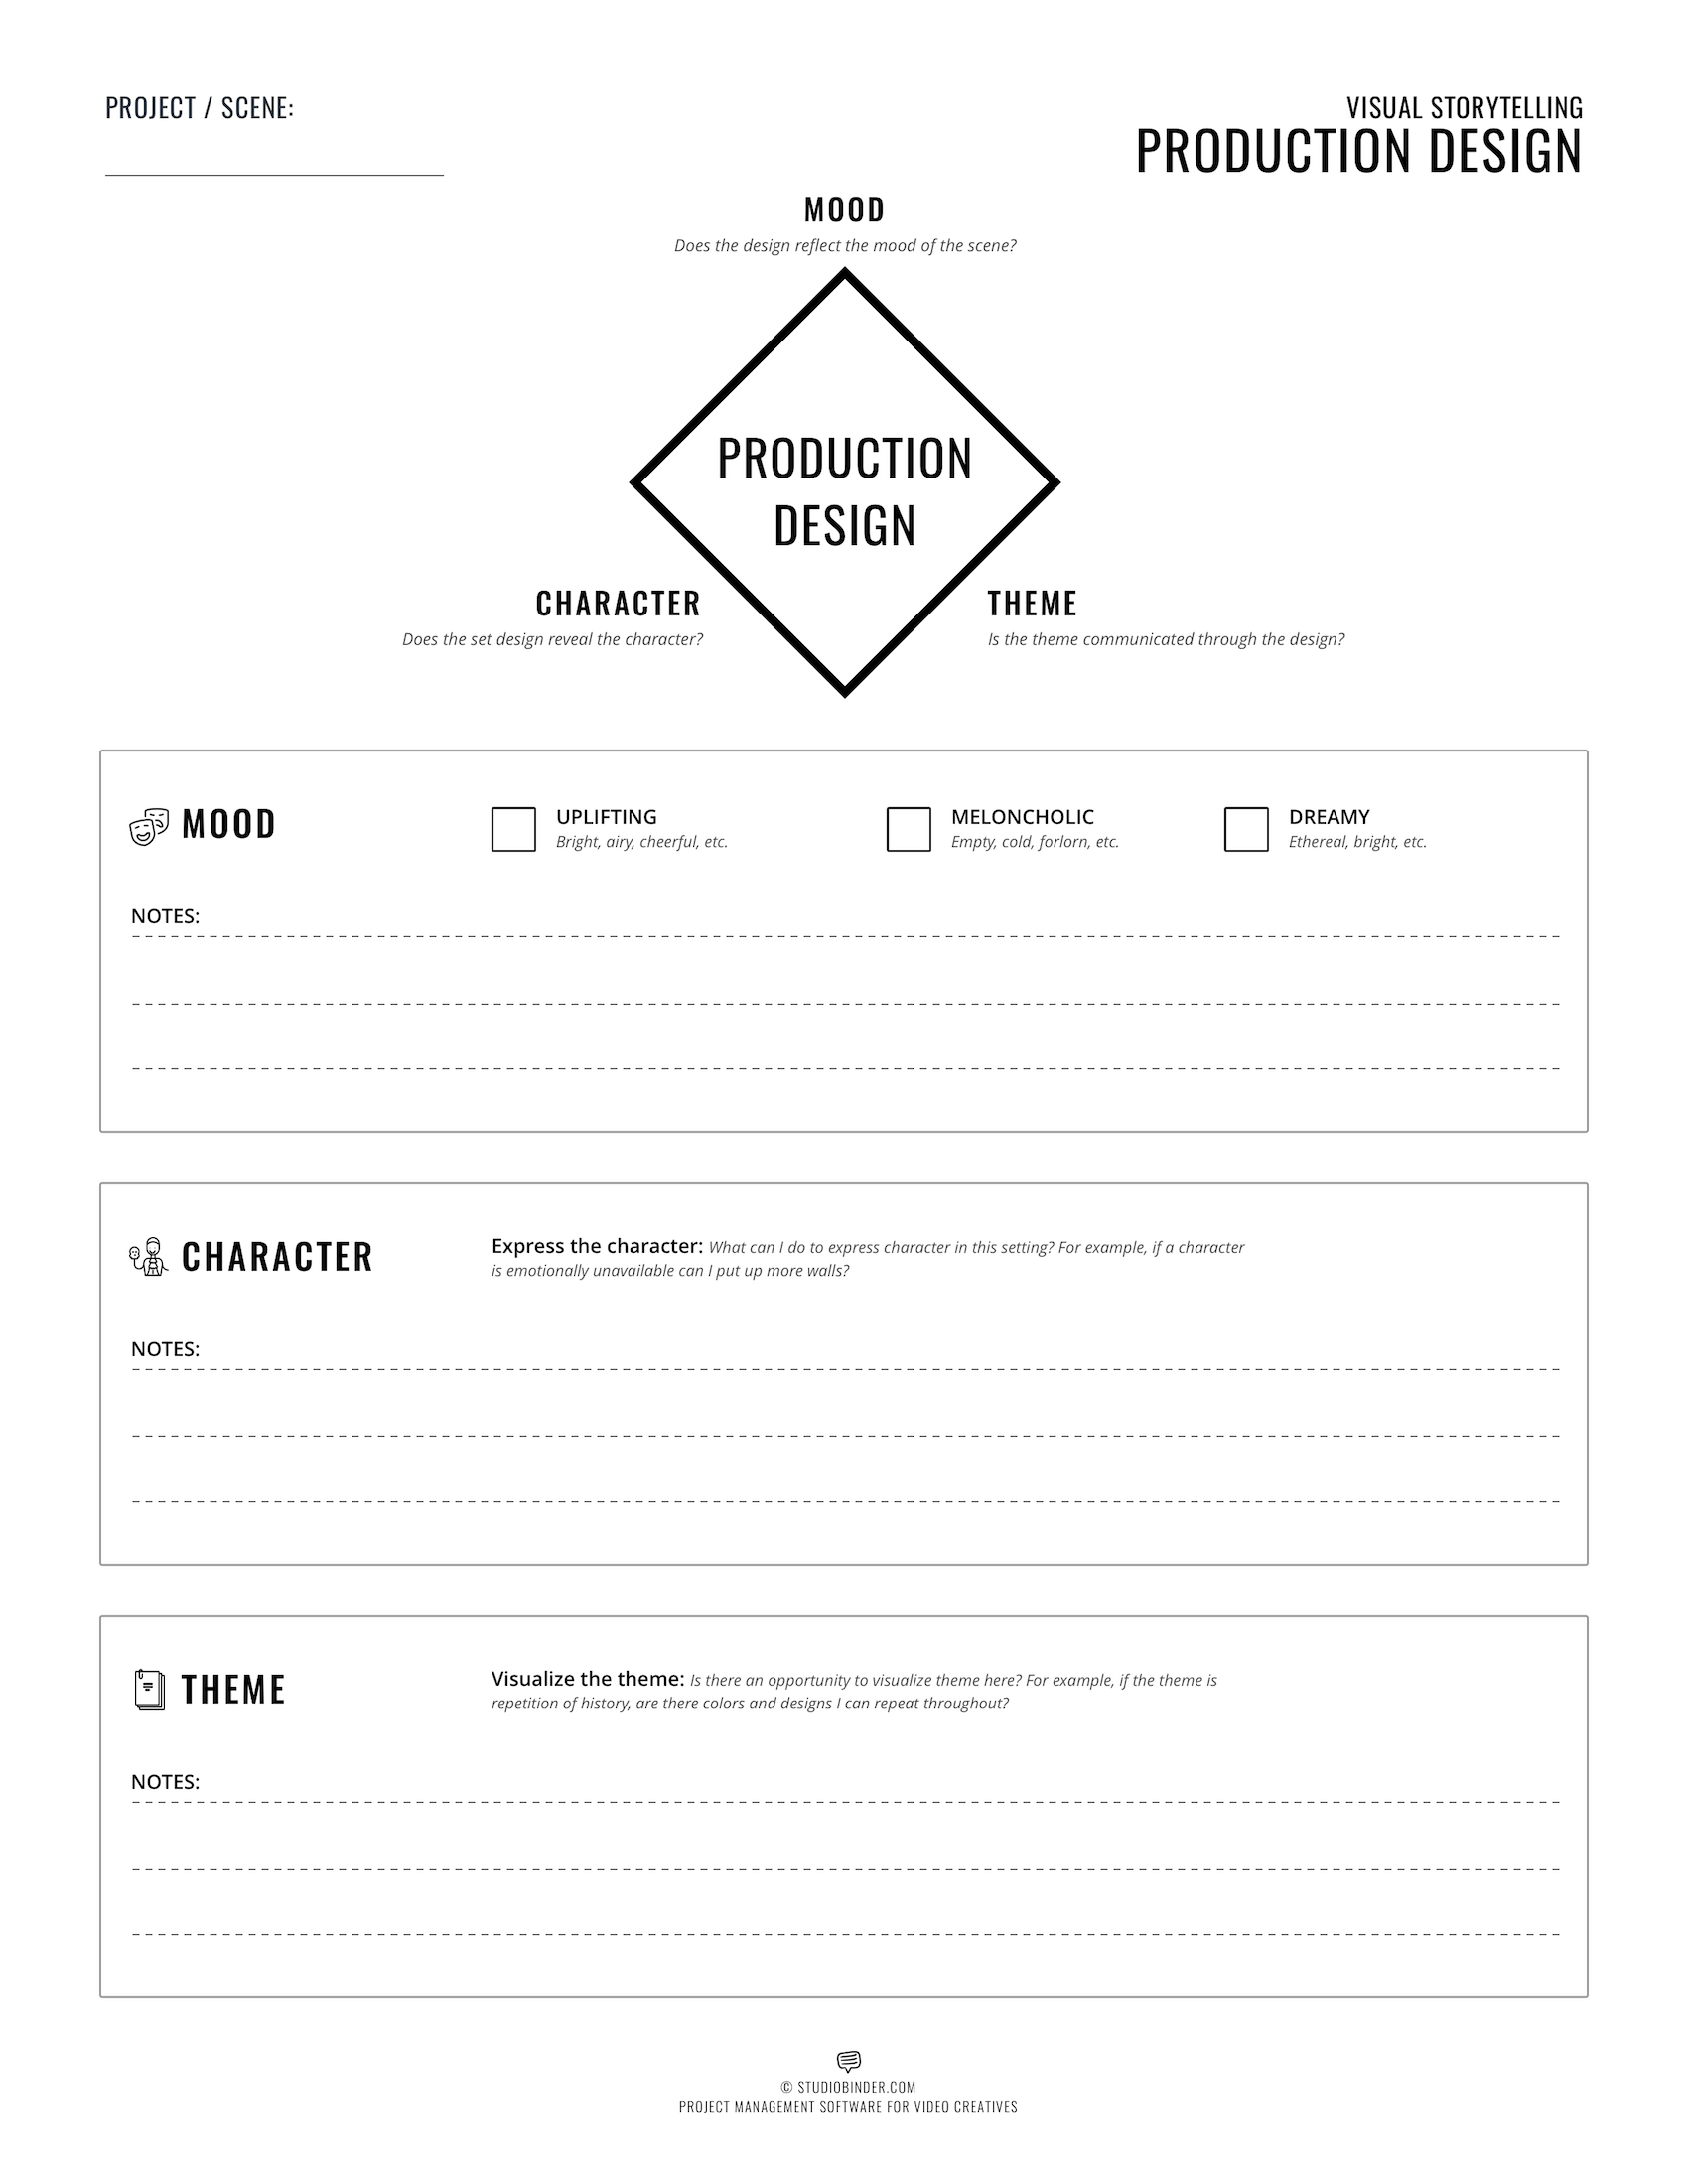 Visual Storytelling - Production Design